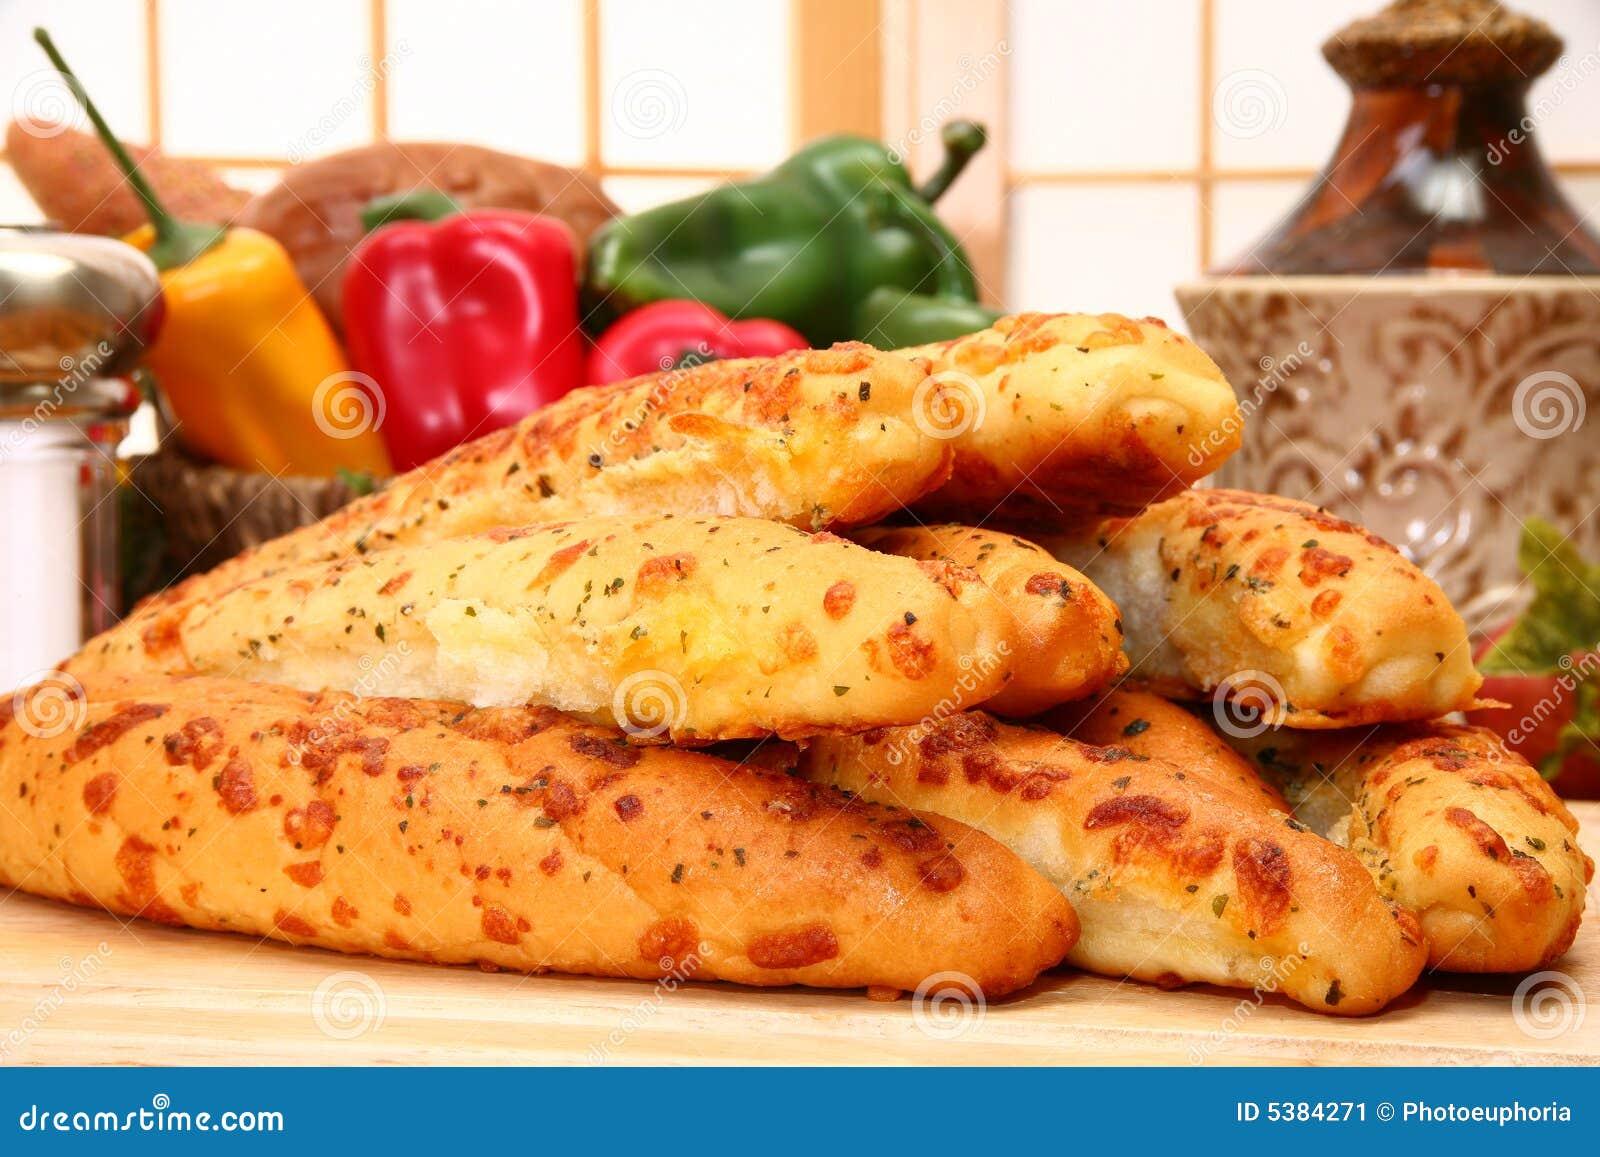 Barras de pan de ajo